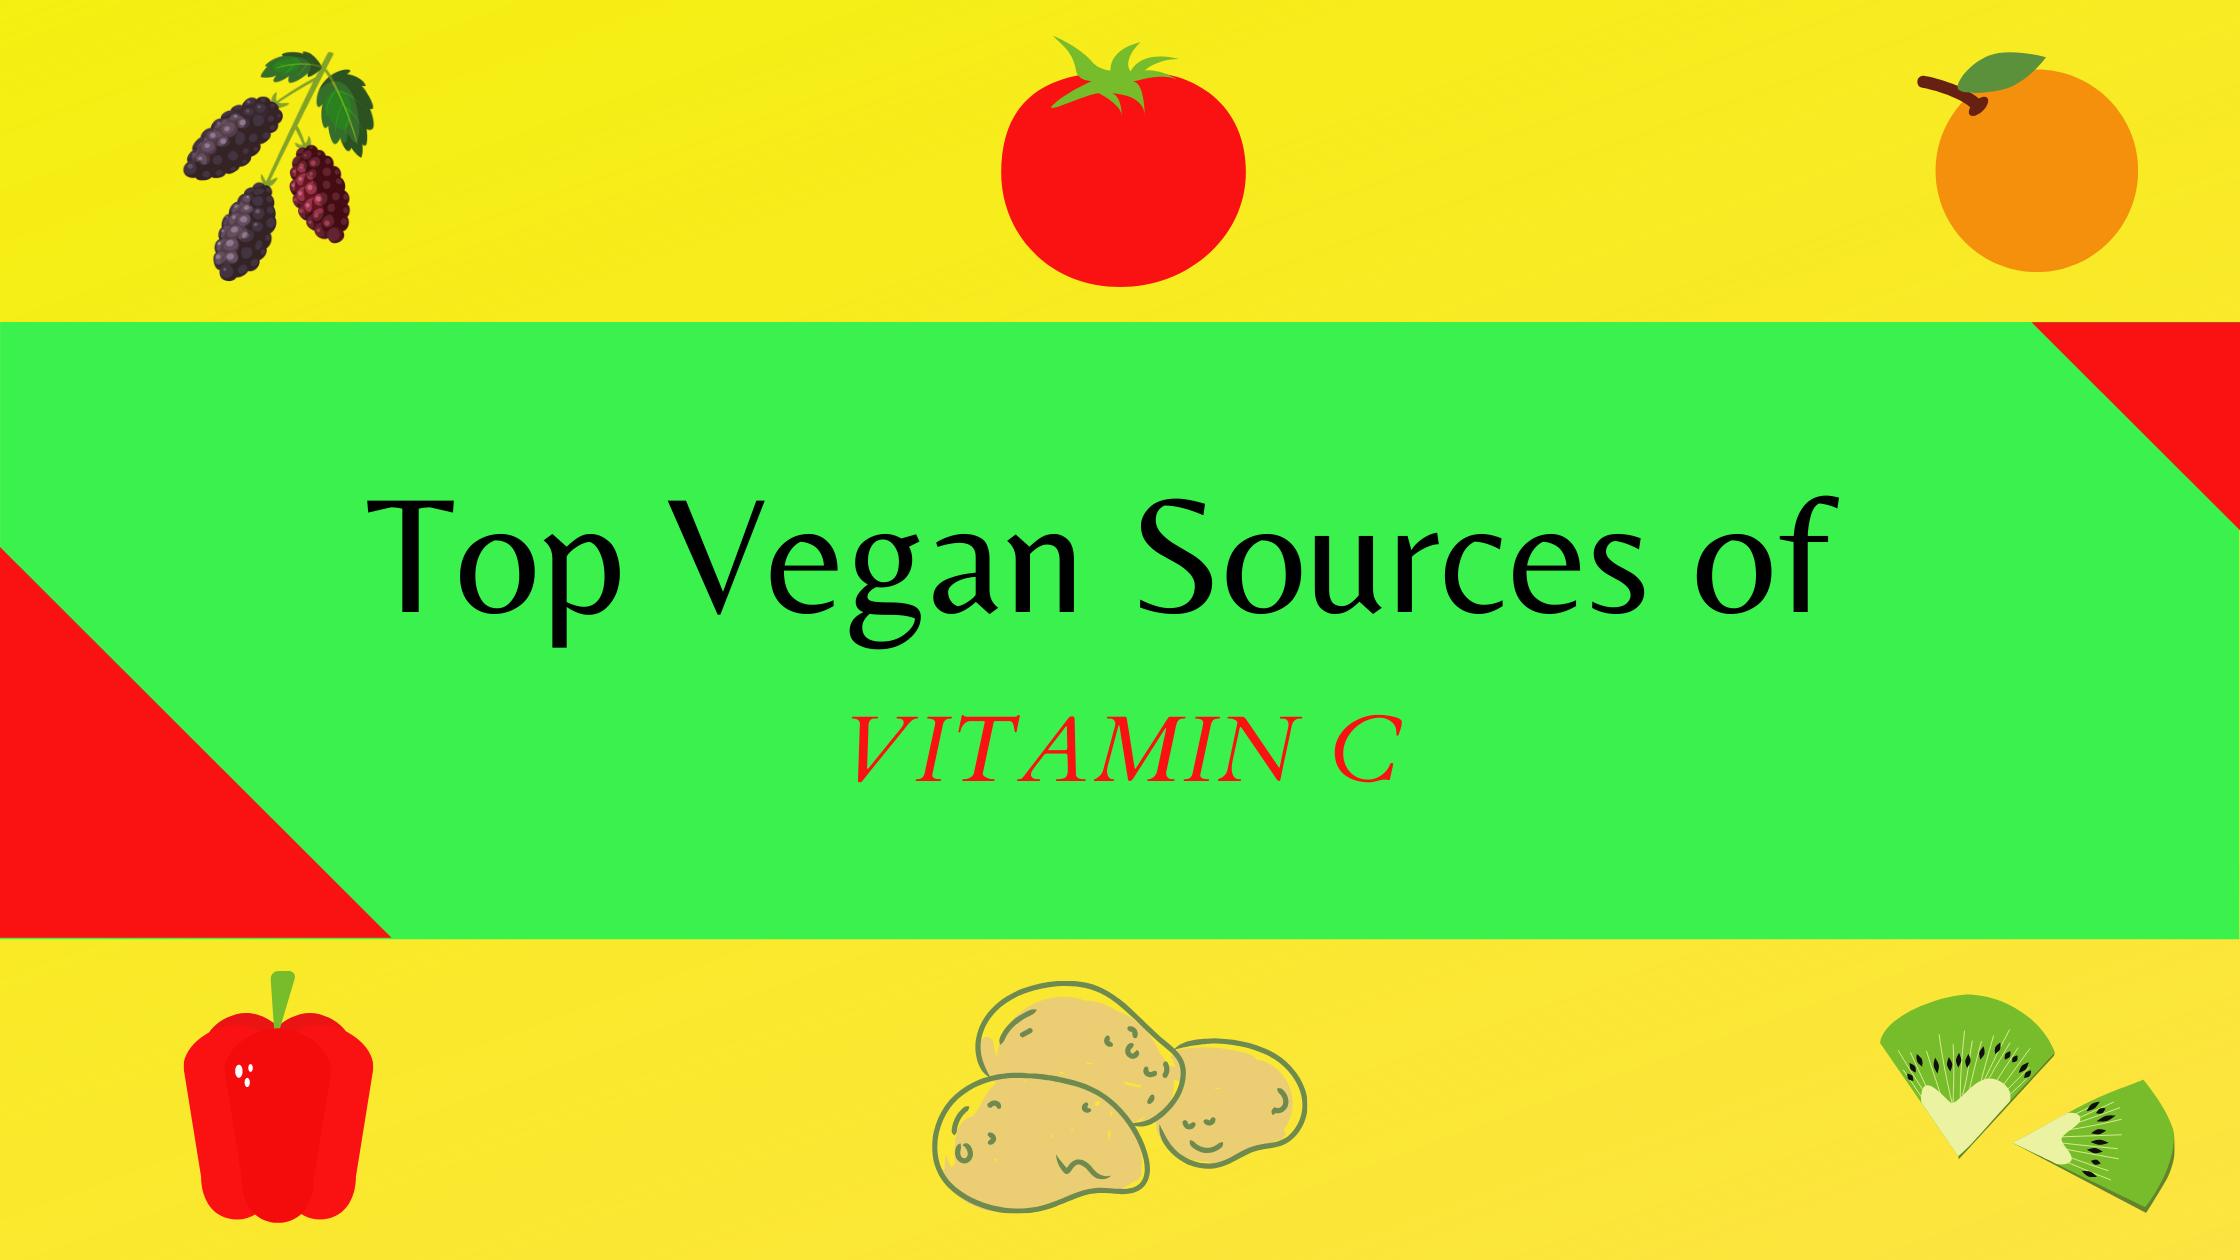 Vitamin C rich food sources